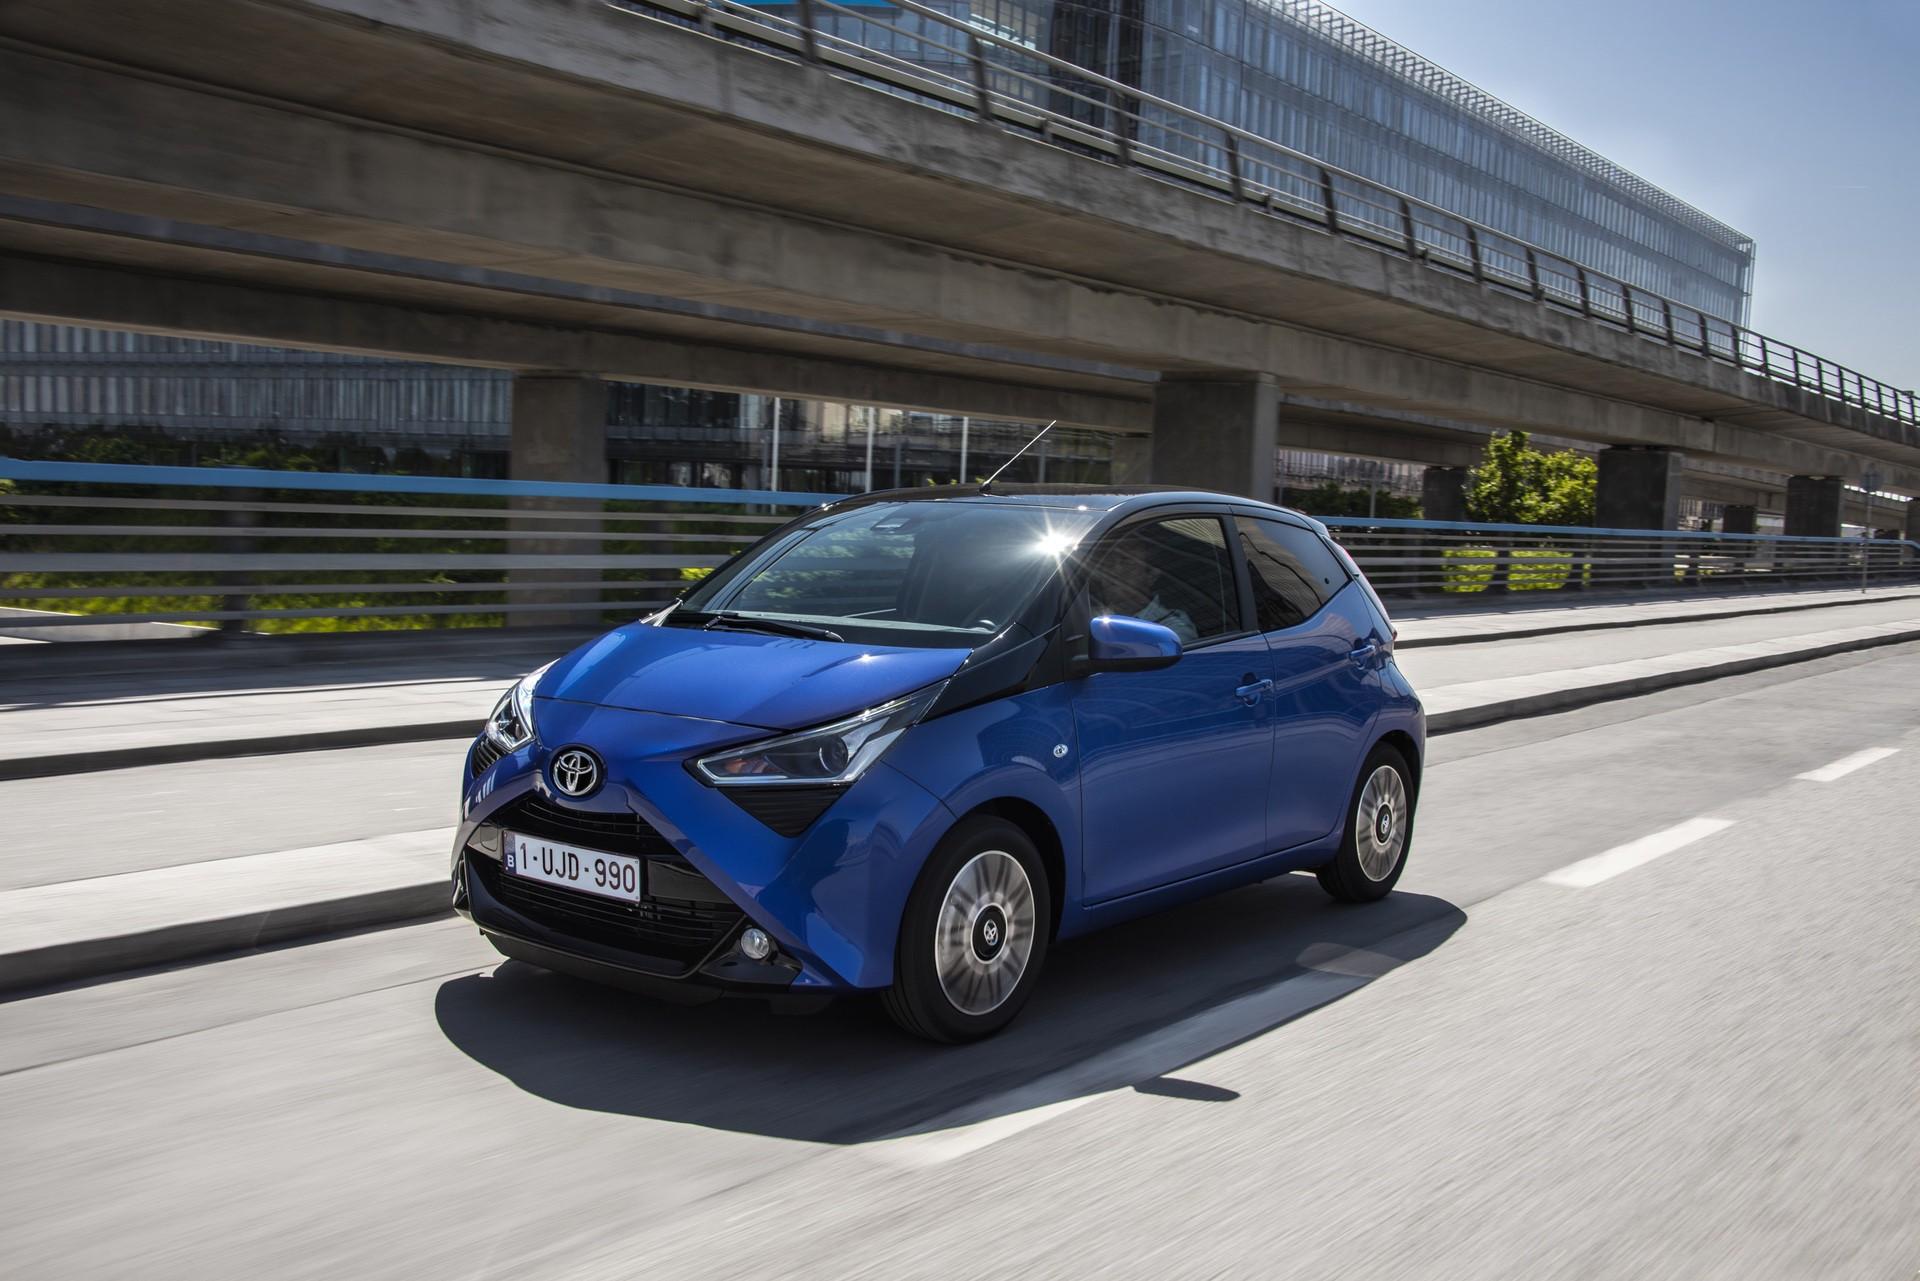 Toyota_Aygo_facelift_presskit_0016